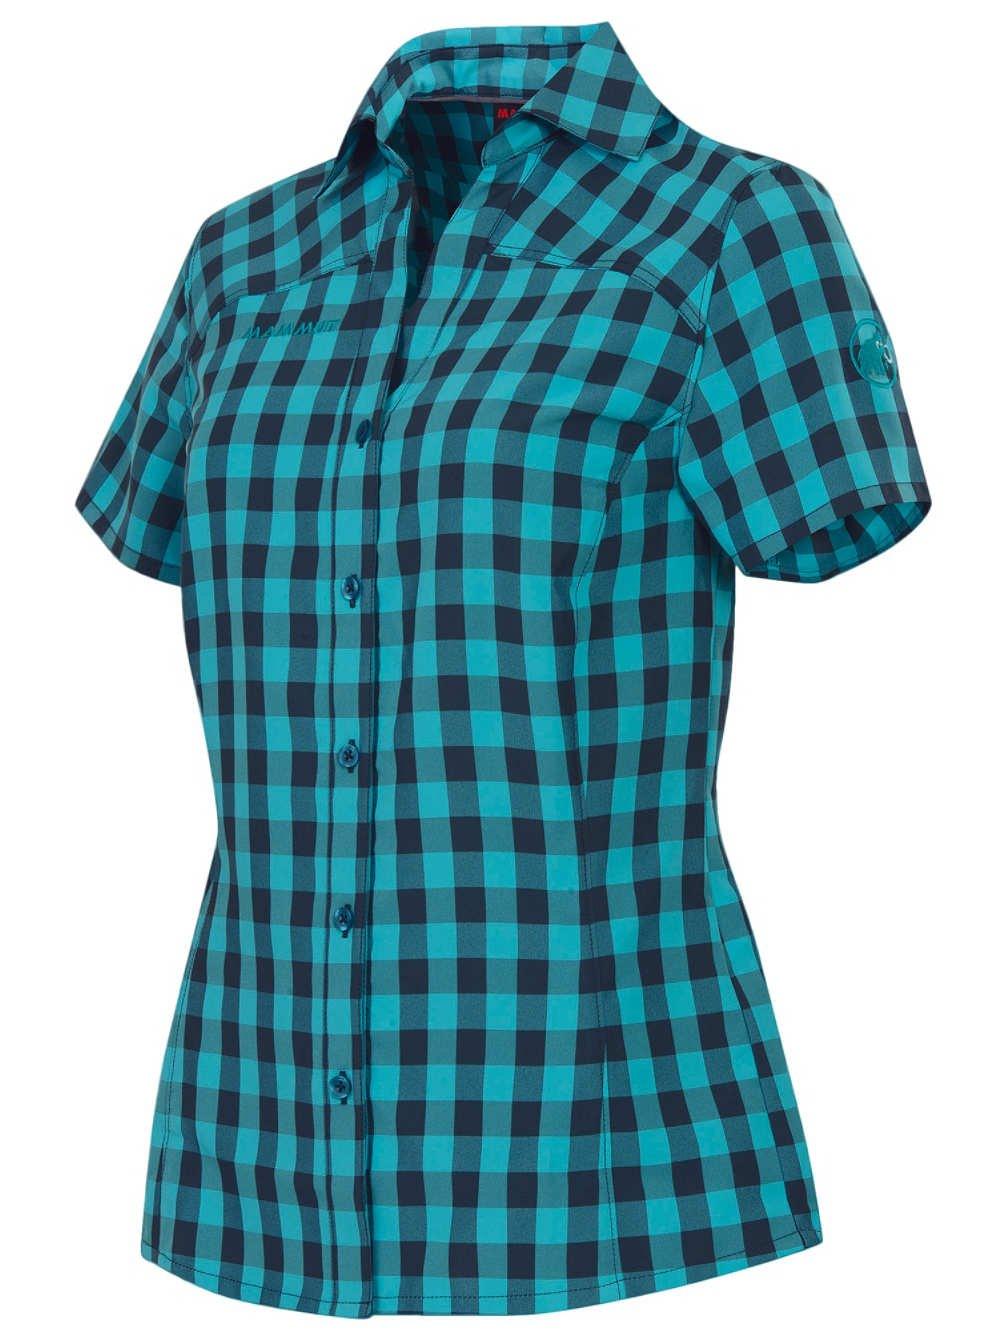 Mammut Aada Shirt Damens - Reisebluse